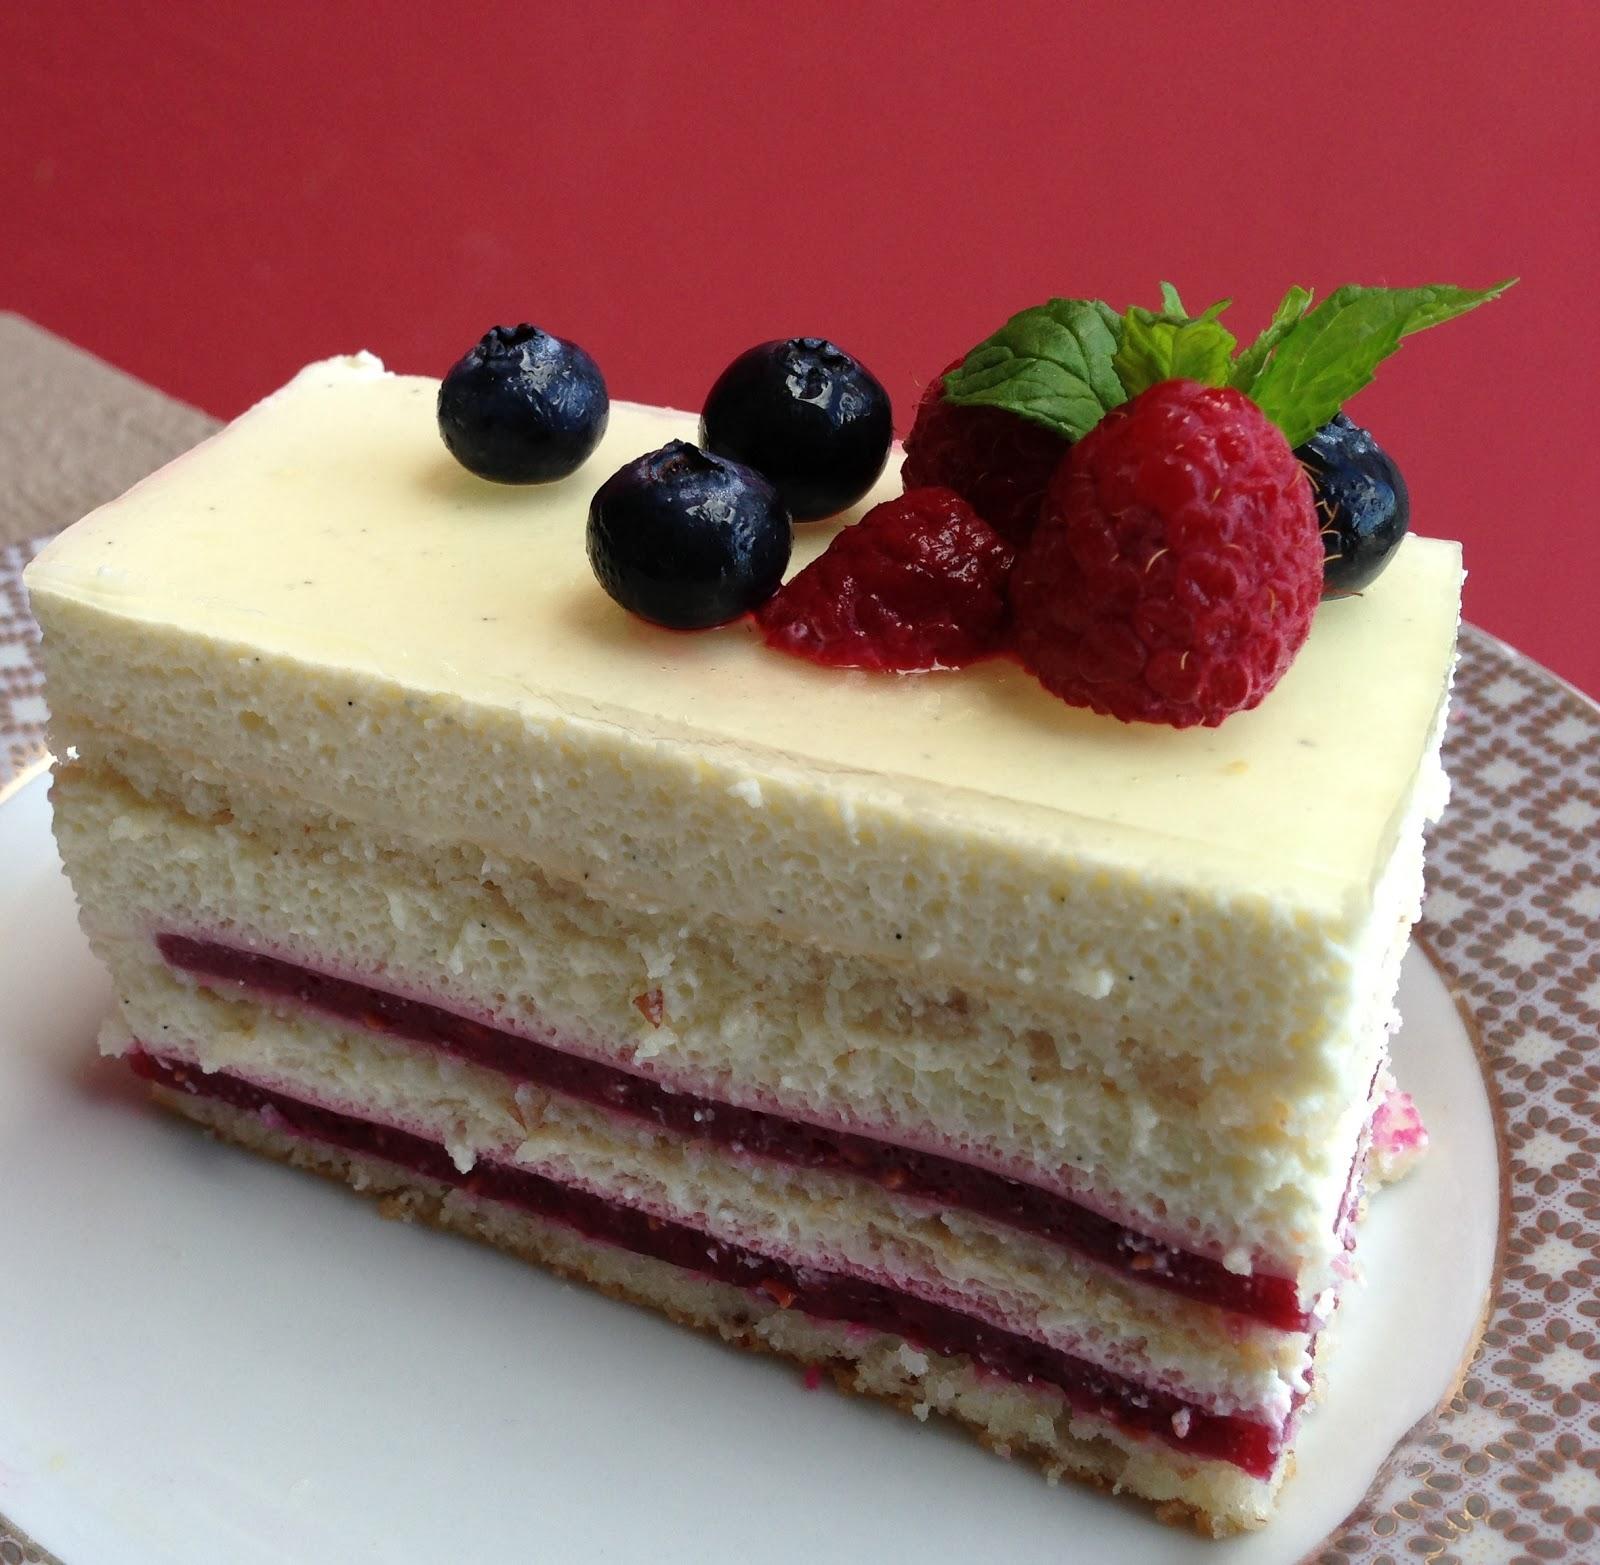 Bavarian Cream Filled Almond Cake